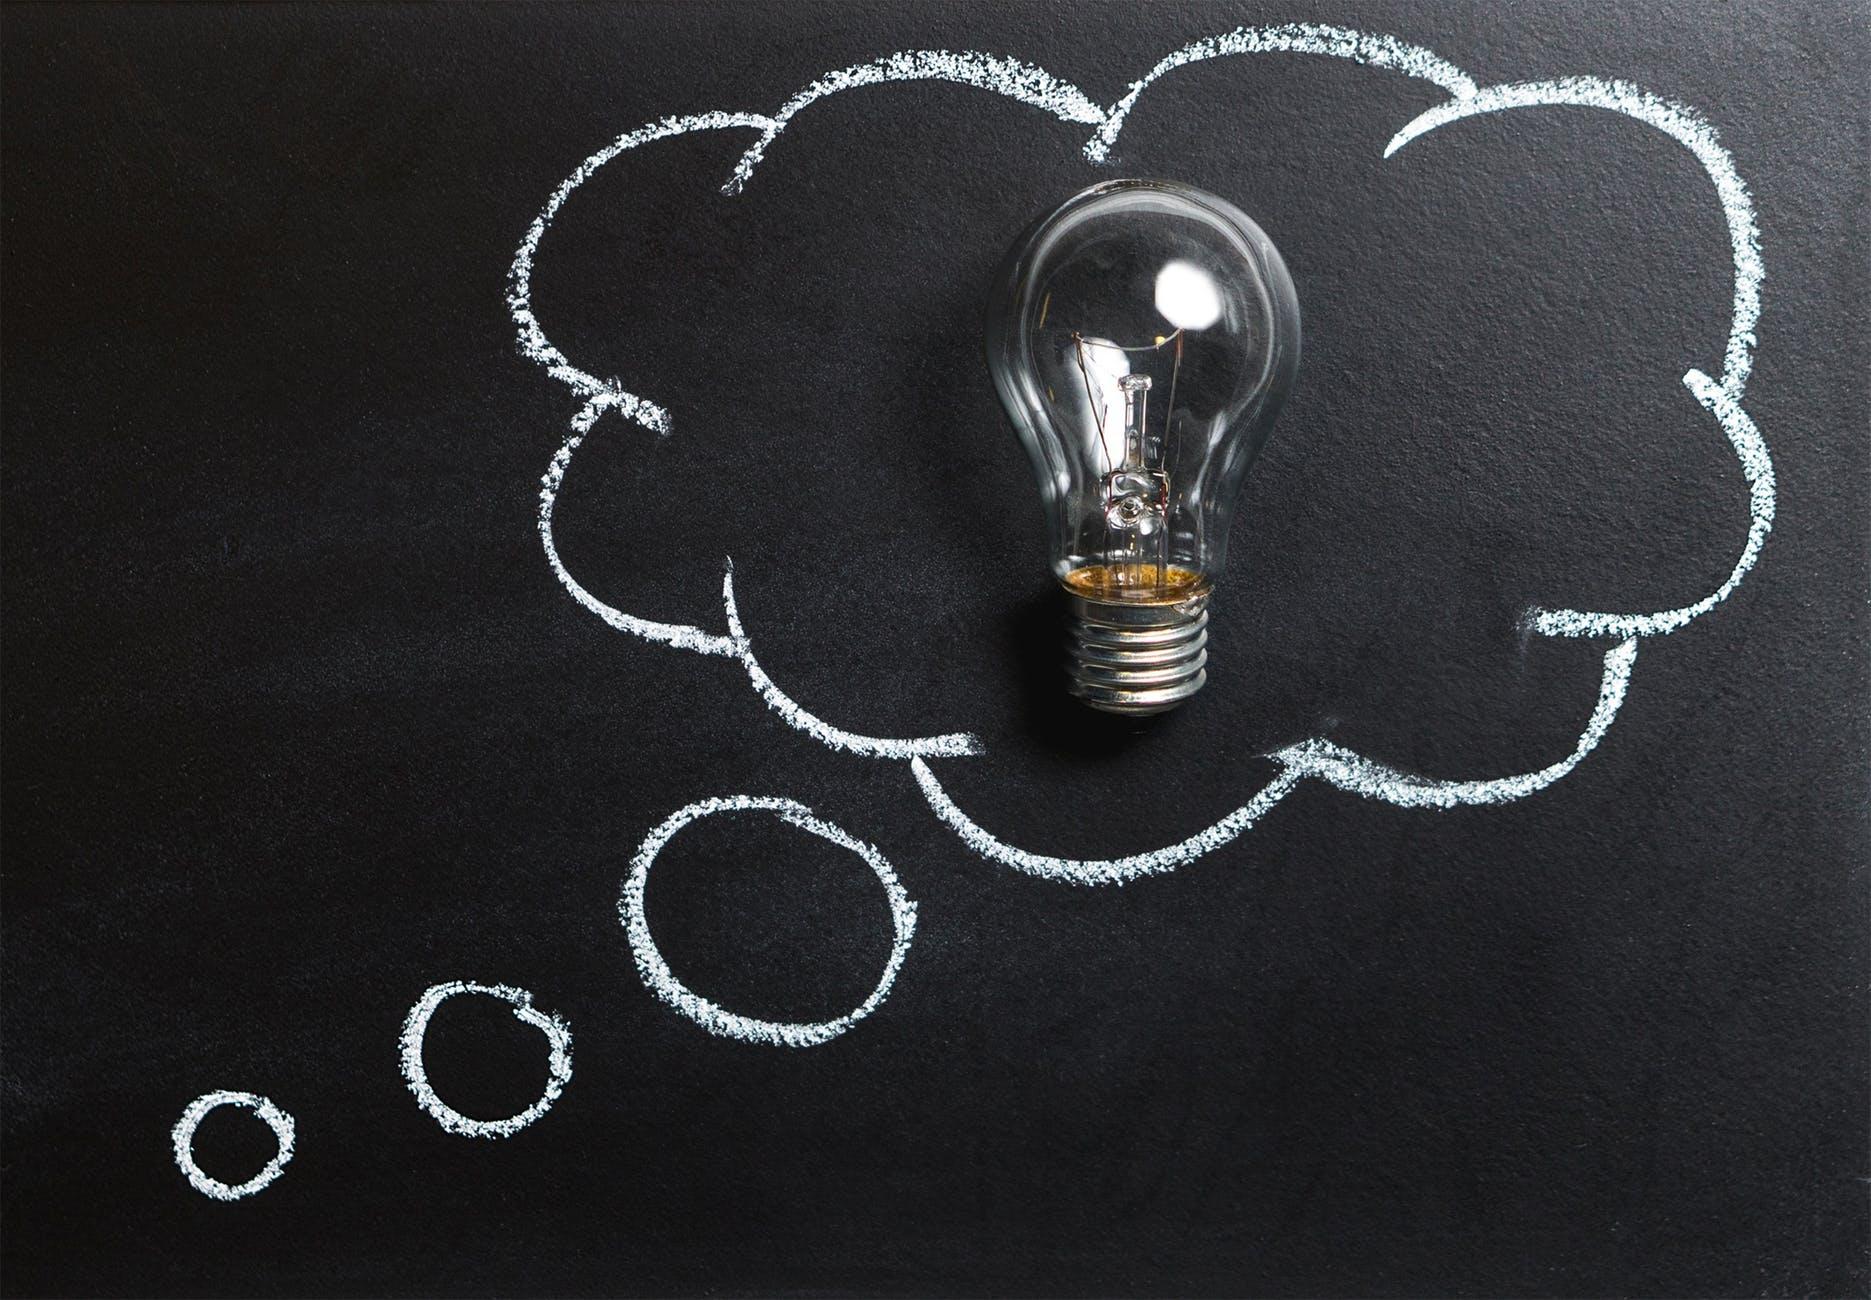 Dupont Analysis - A powerful tool to analyze companies